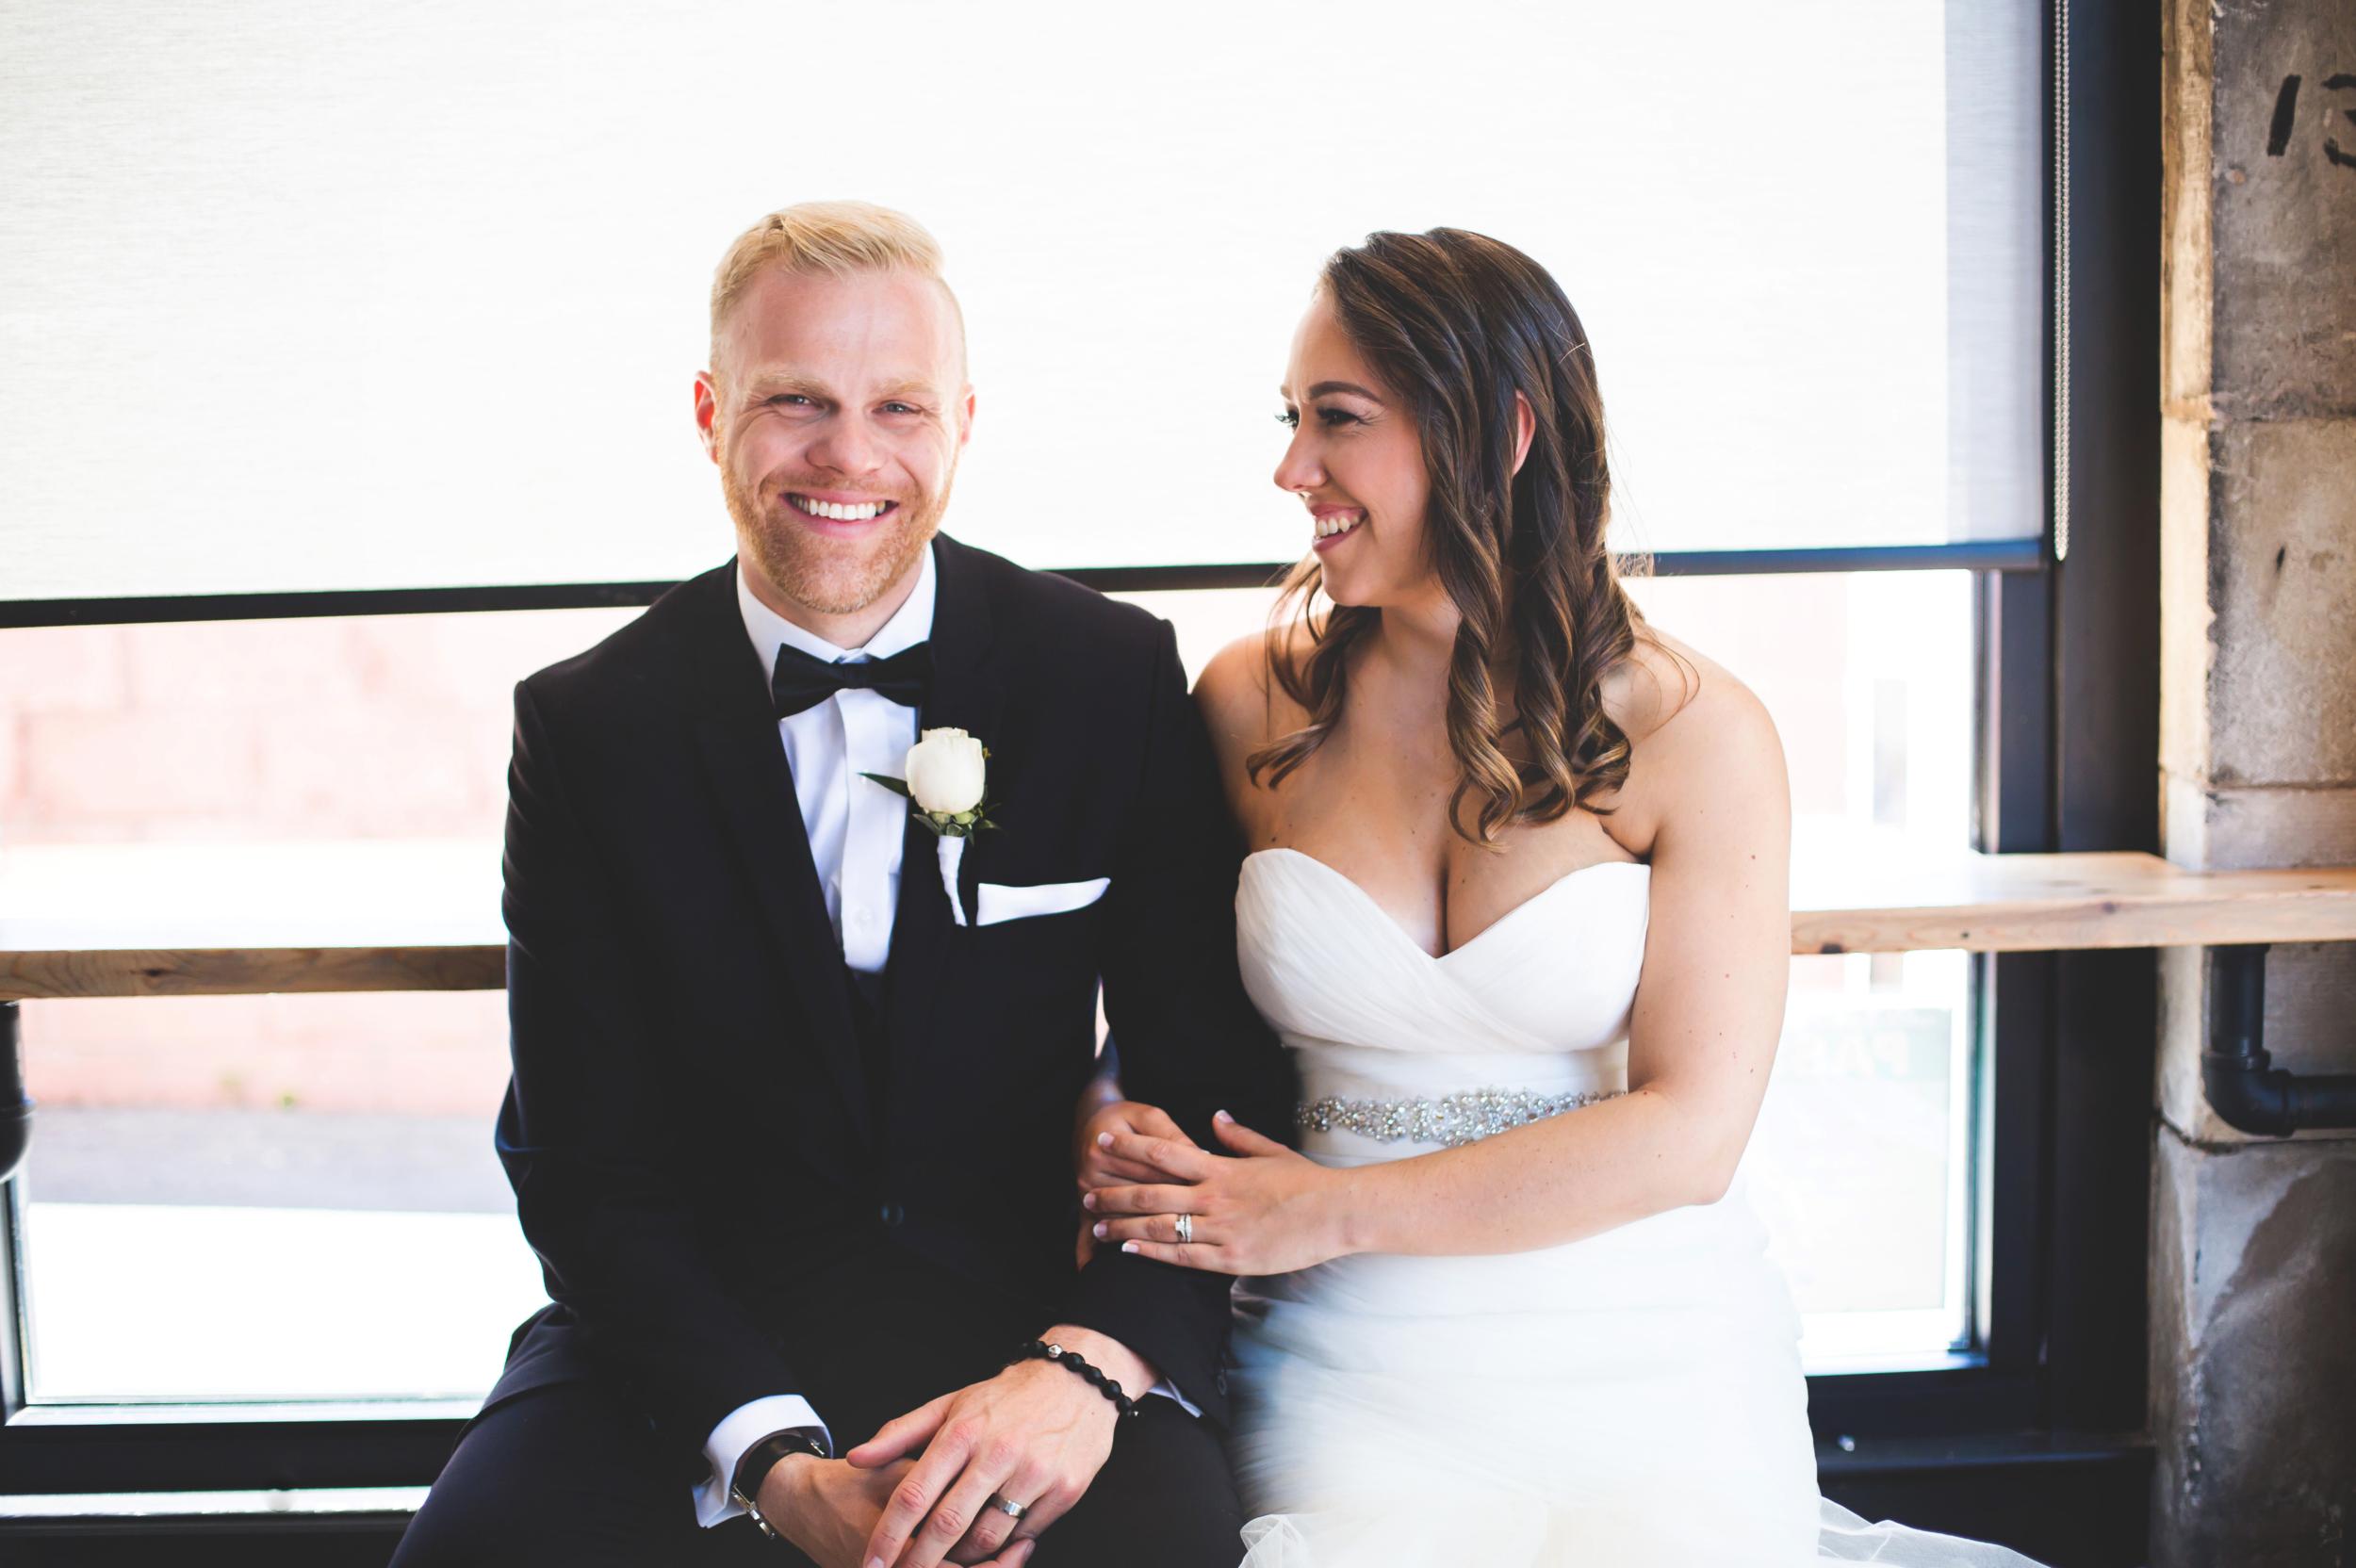 Wedding-Harbour-Banquet-Center-Oakville-Photographer-Wedding-Hamilton-Saint-James-Espresso-Downtown-HamOnt-GTA-Niagara-Toronto-Moments-by-Lauren-Photography-Photo-Image-24.png